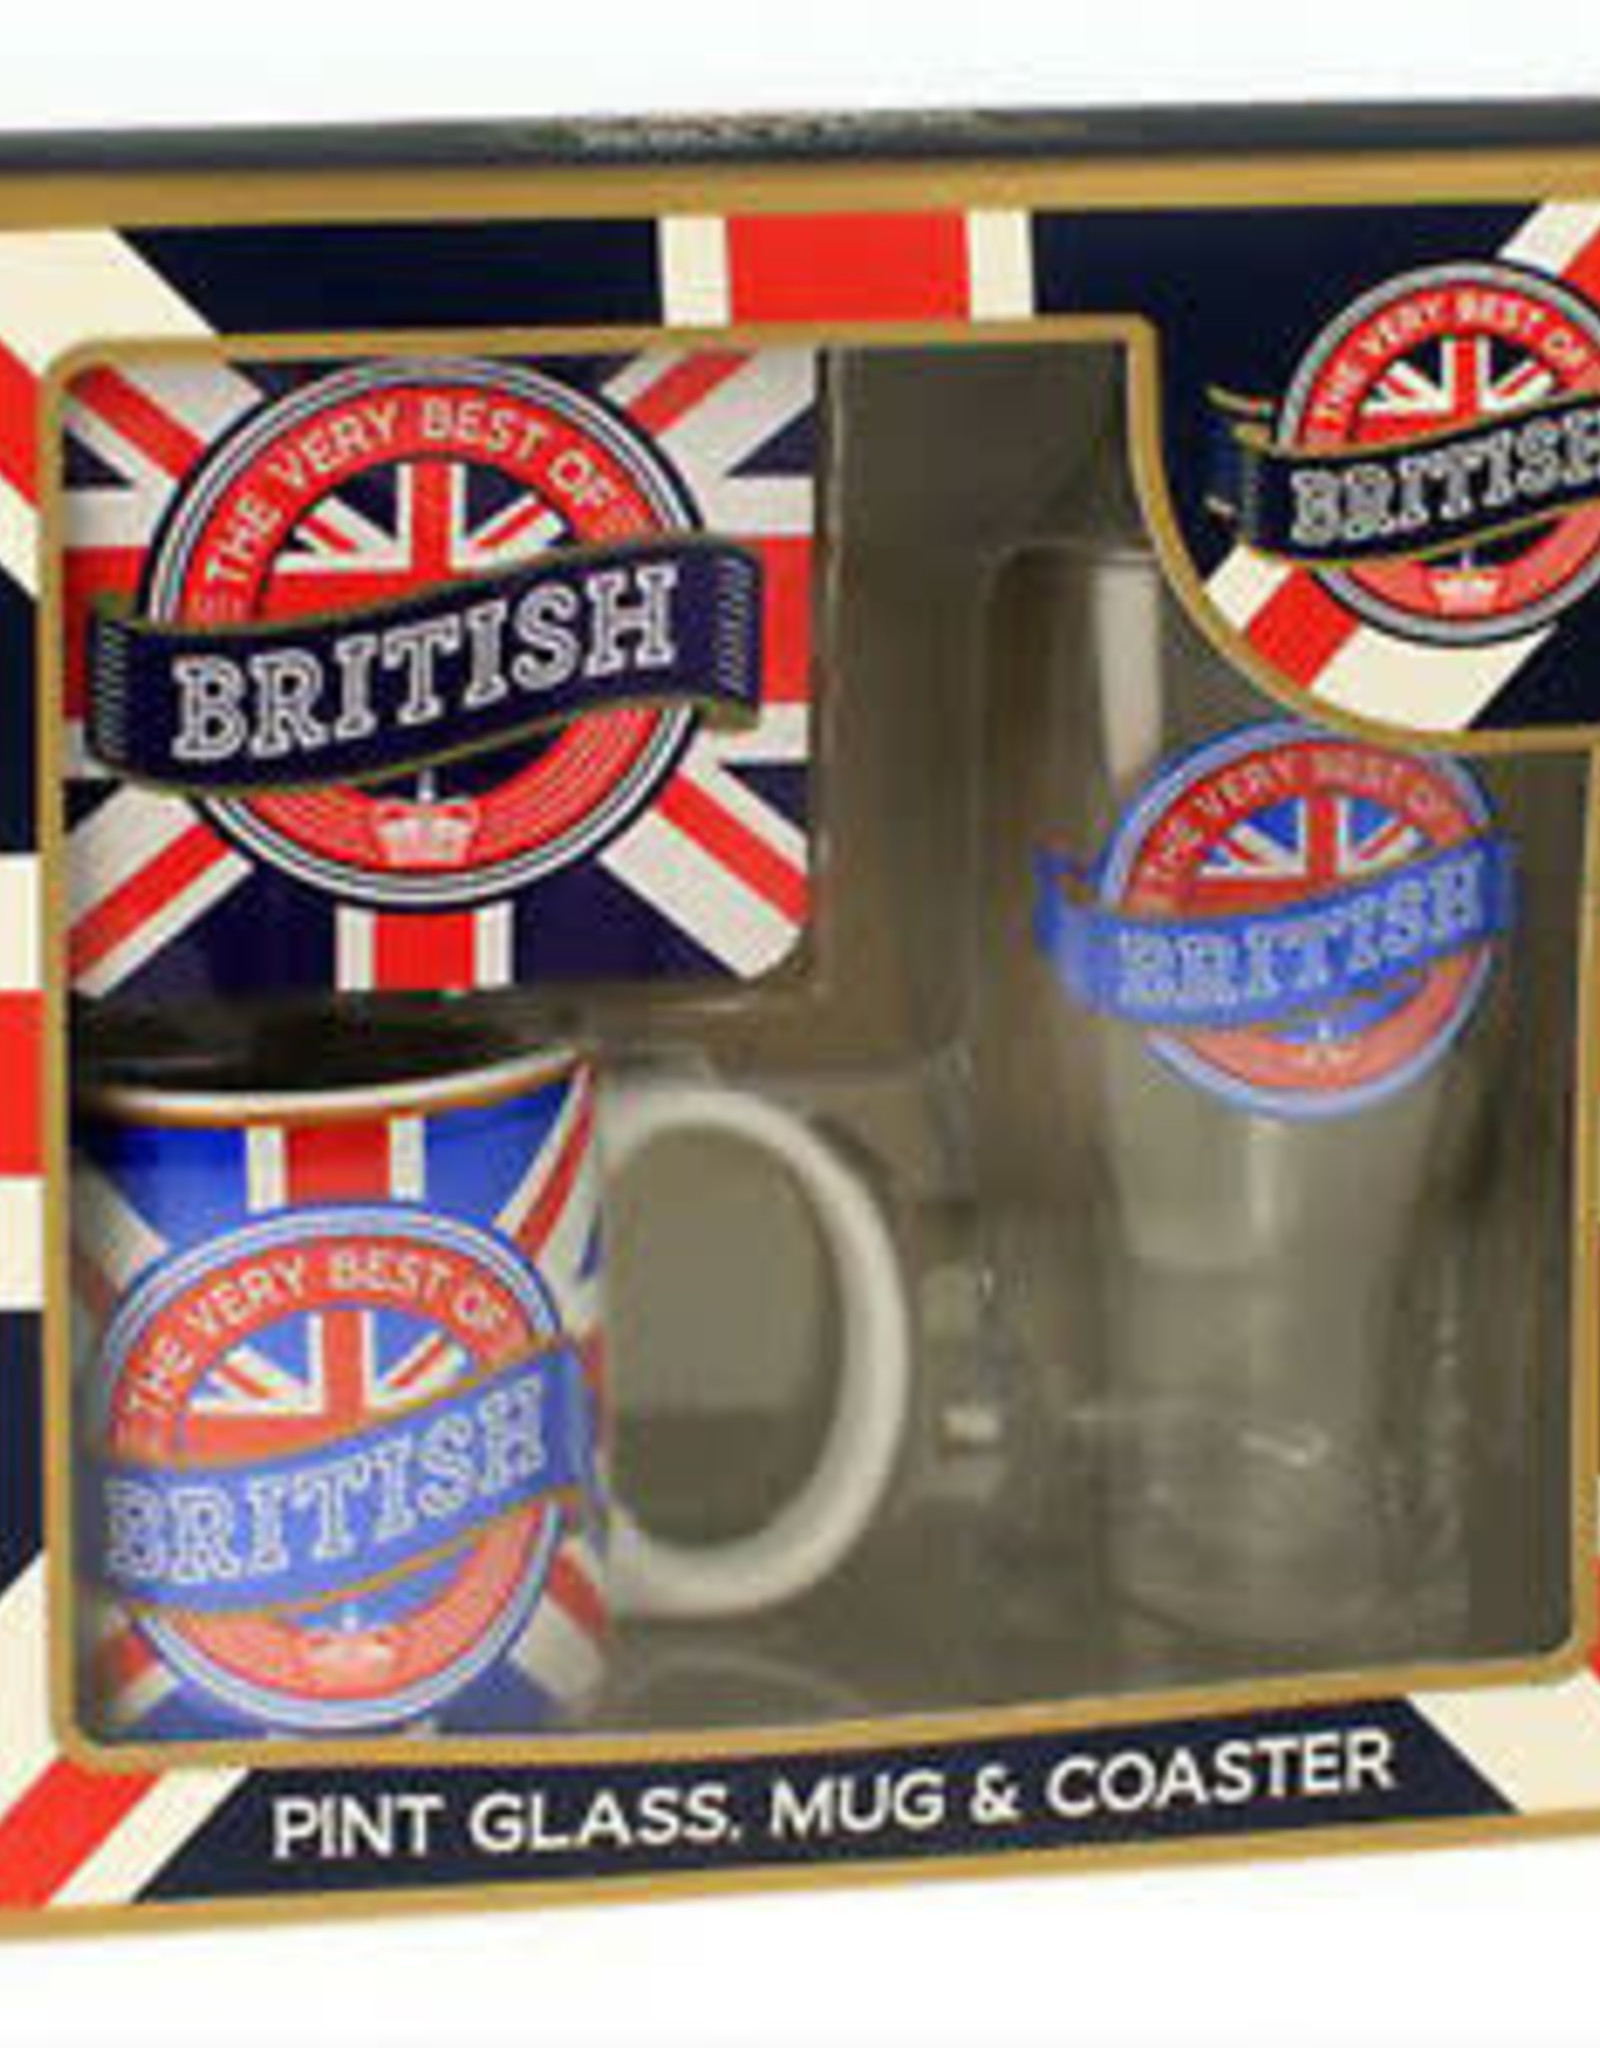 Elgate British Pint Glass, Mug and Coaster Set